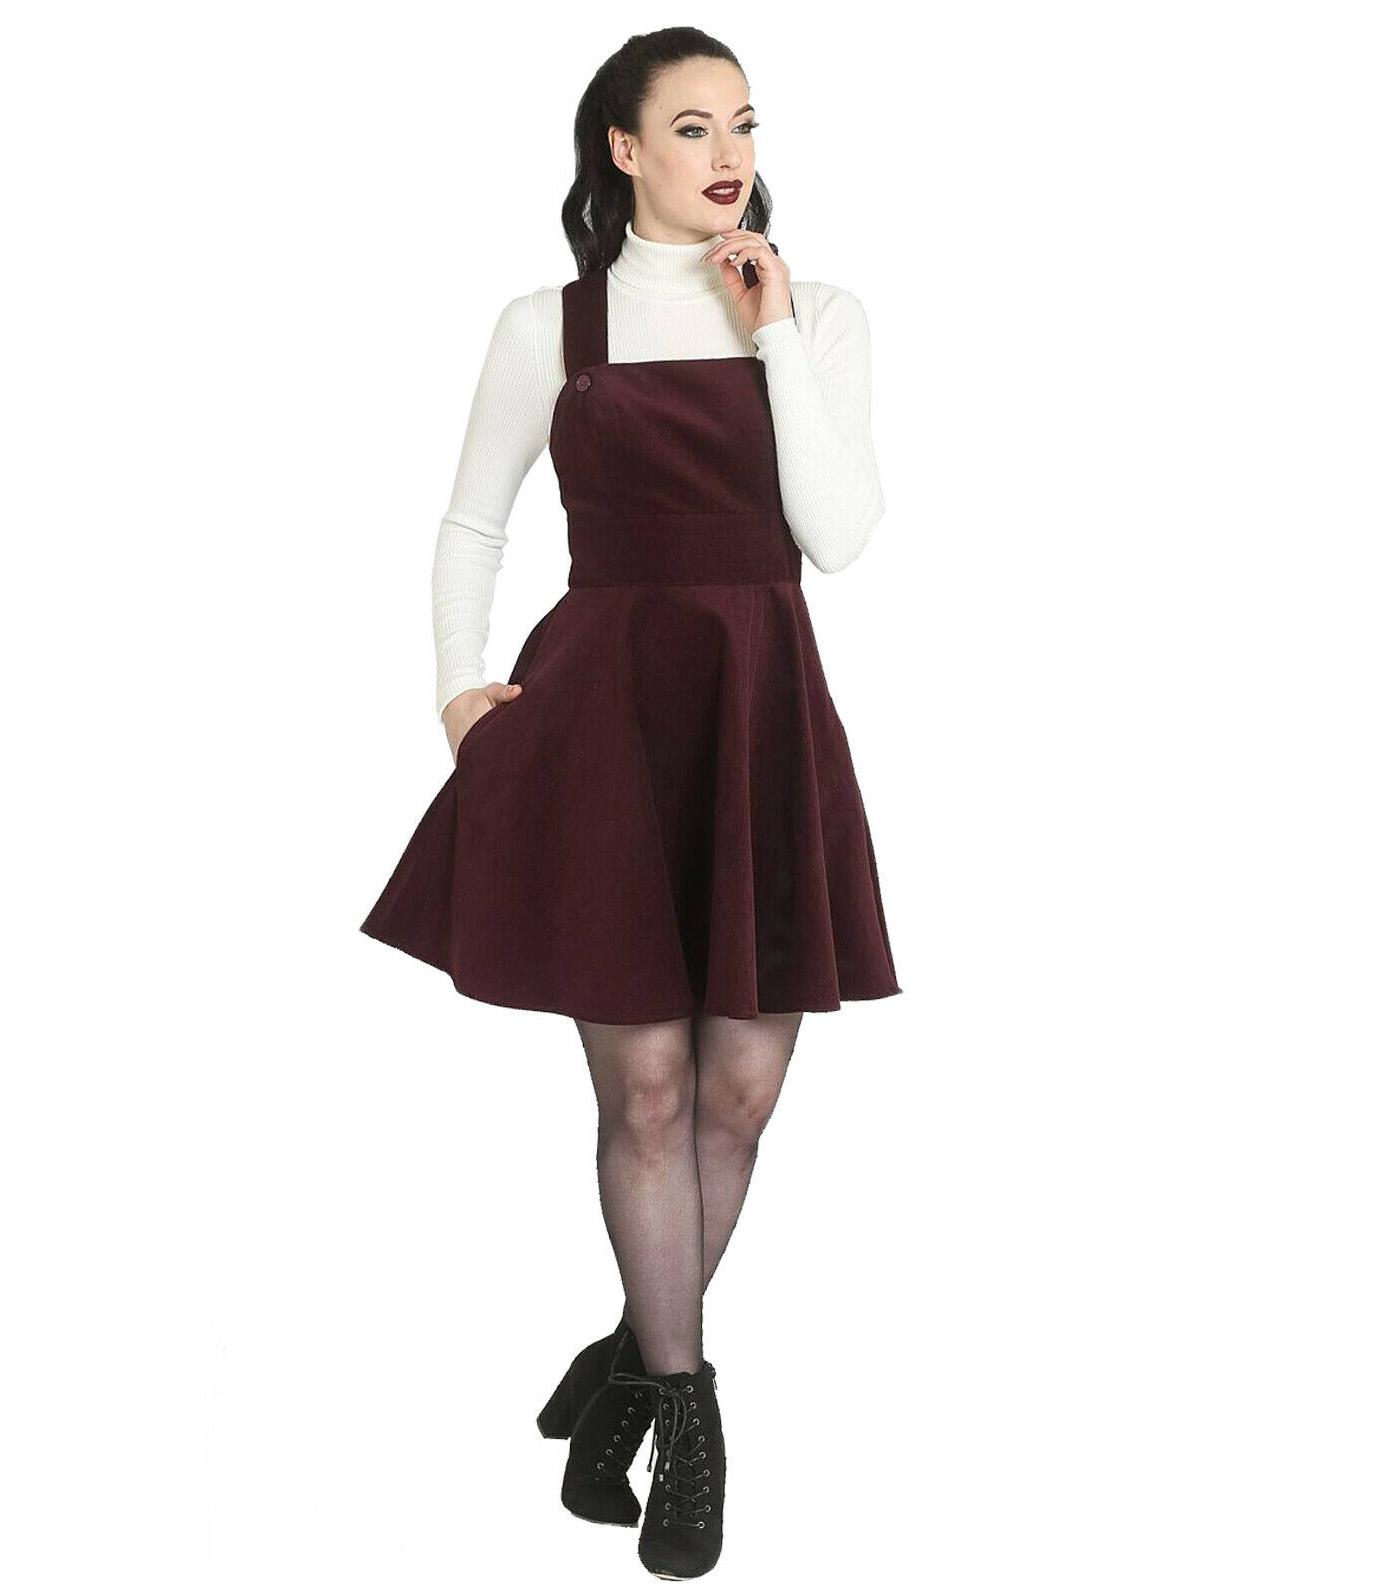 Hell-Bunny-Rockabilly-Corduroy-Mini-Dress-WONDER-YEARS-Pinafore-Wine-All-Sizes thumbnail 7